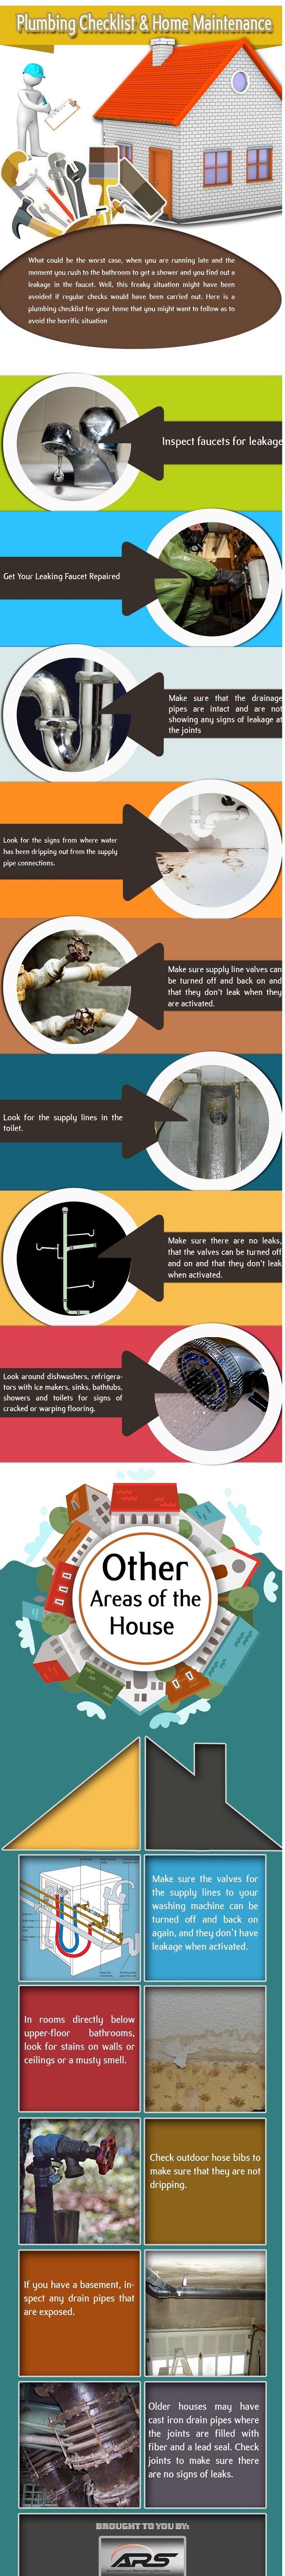 home inspection plumbing checklist